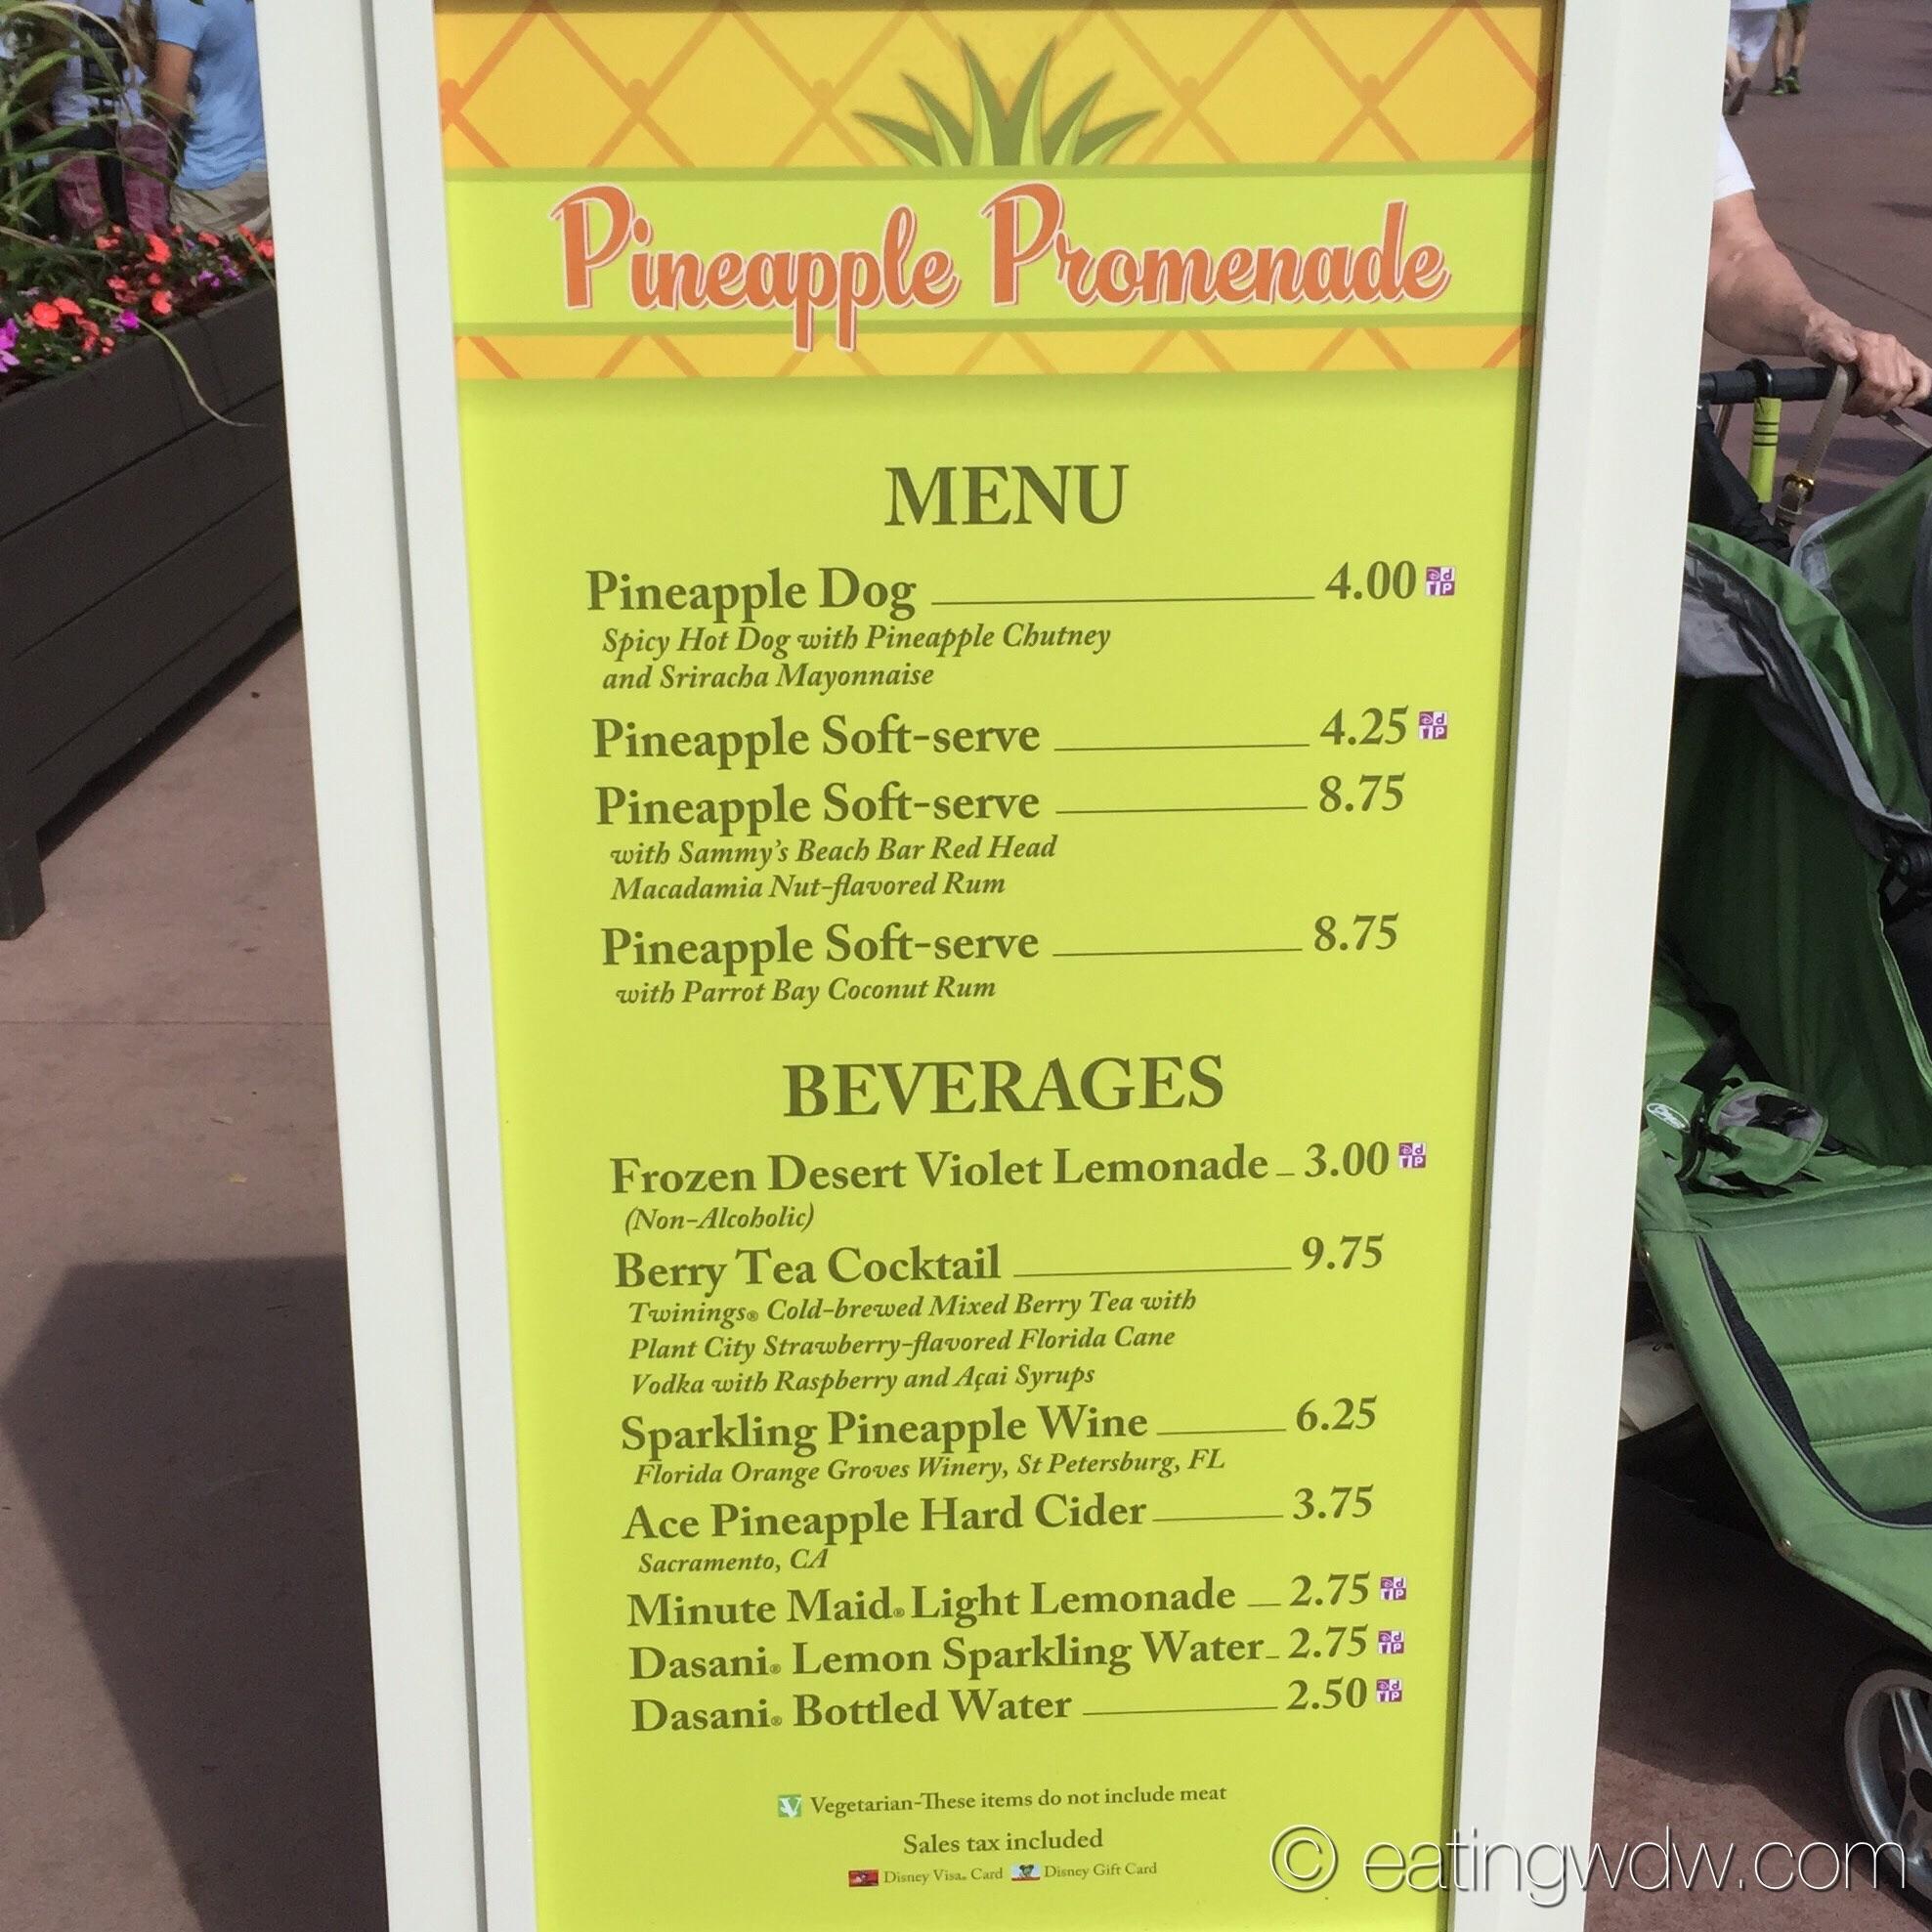 2015 epcot international flower & garden festival menu prices